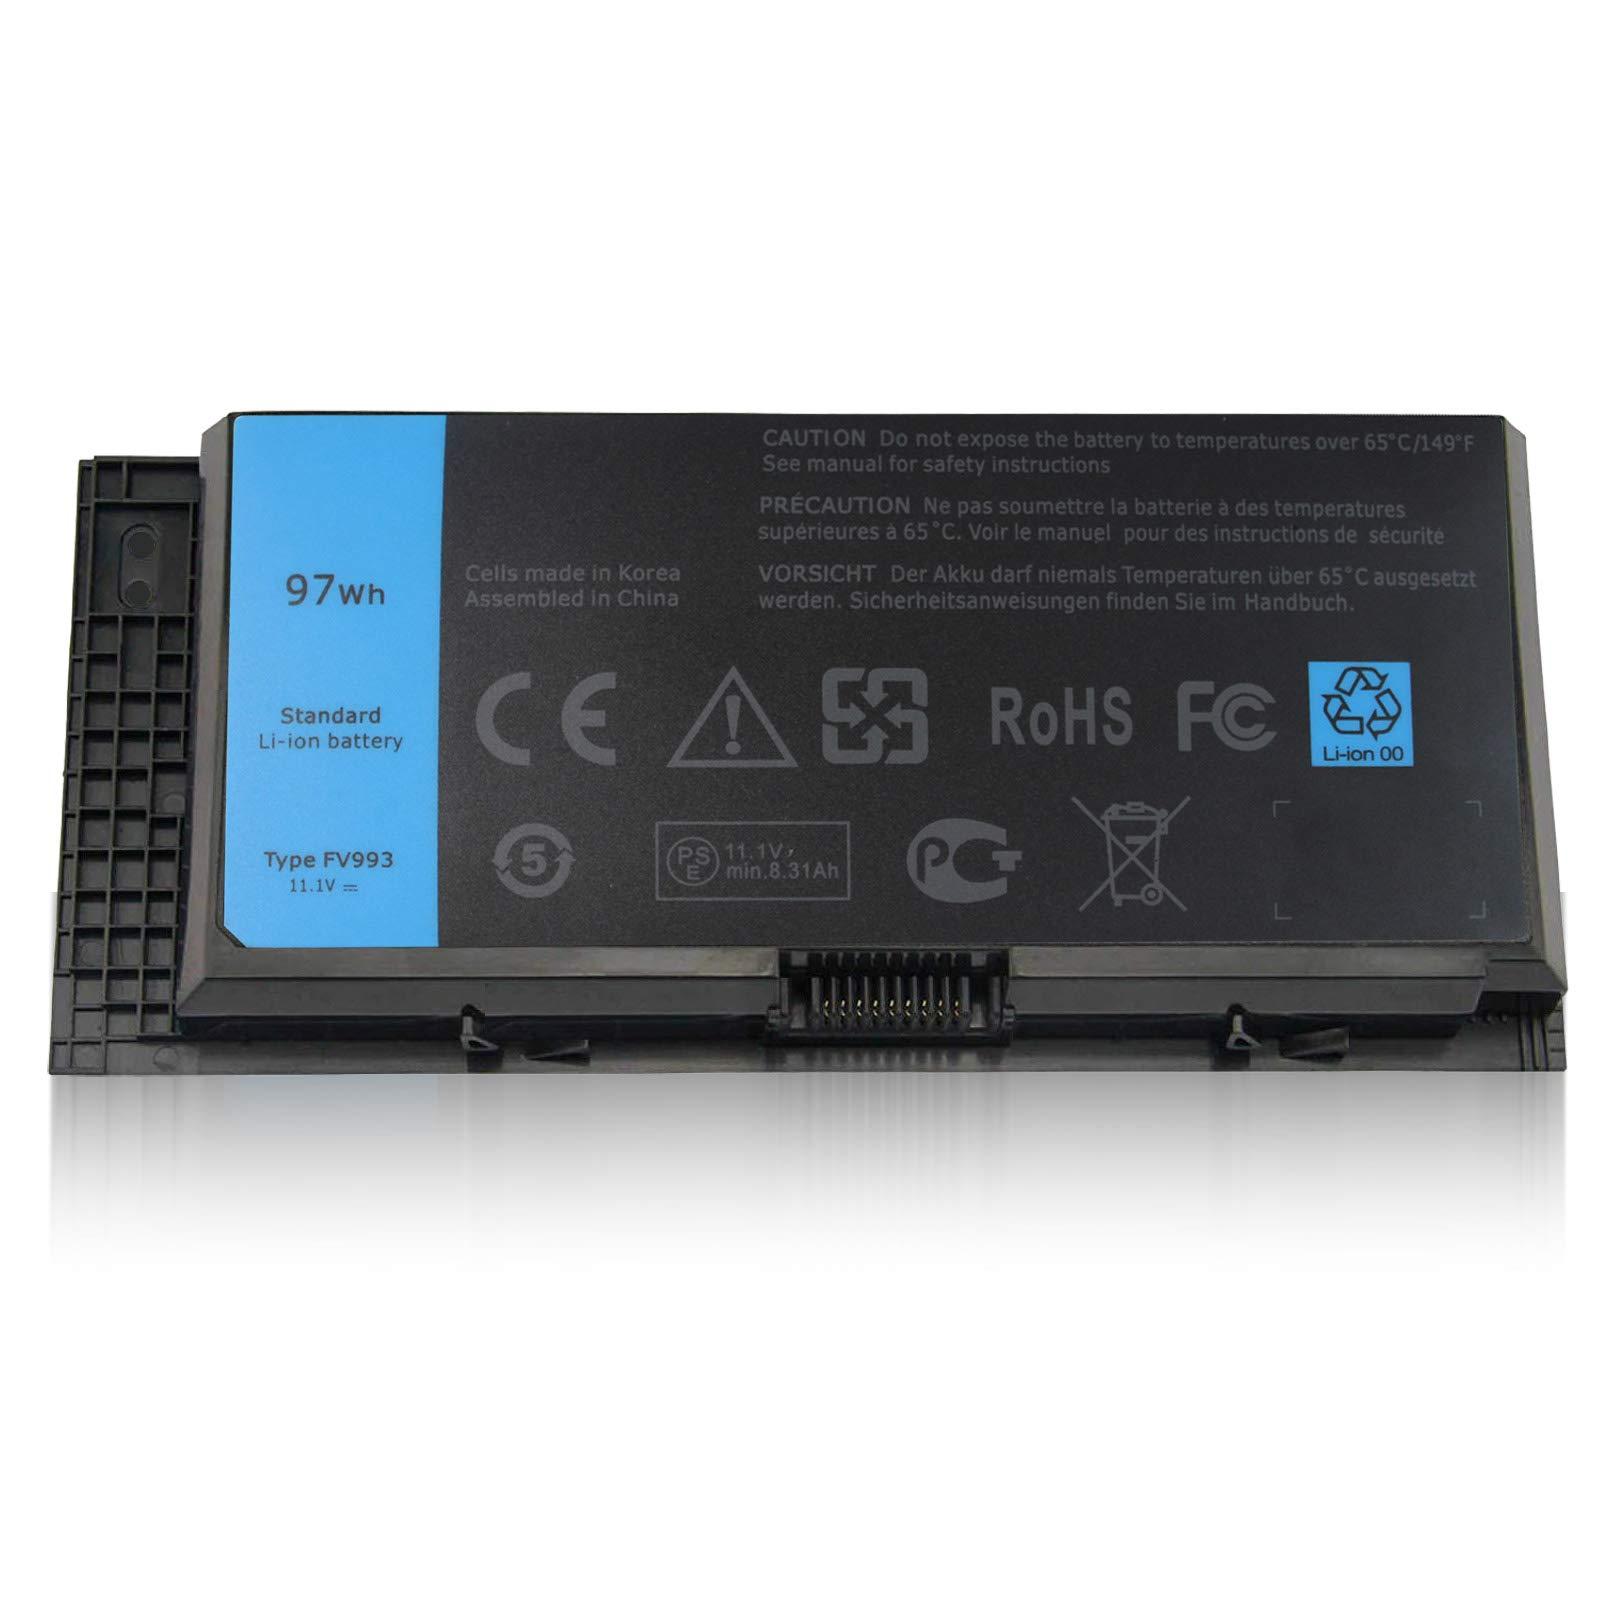 Bateria 97Wh para Dell Precision M4600 M4700 M4800 M6600 M6700 M6800 Series JHYP2 PG6RC V7M28 K4RDX 0K4RDX 12 !